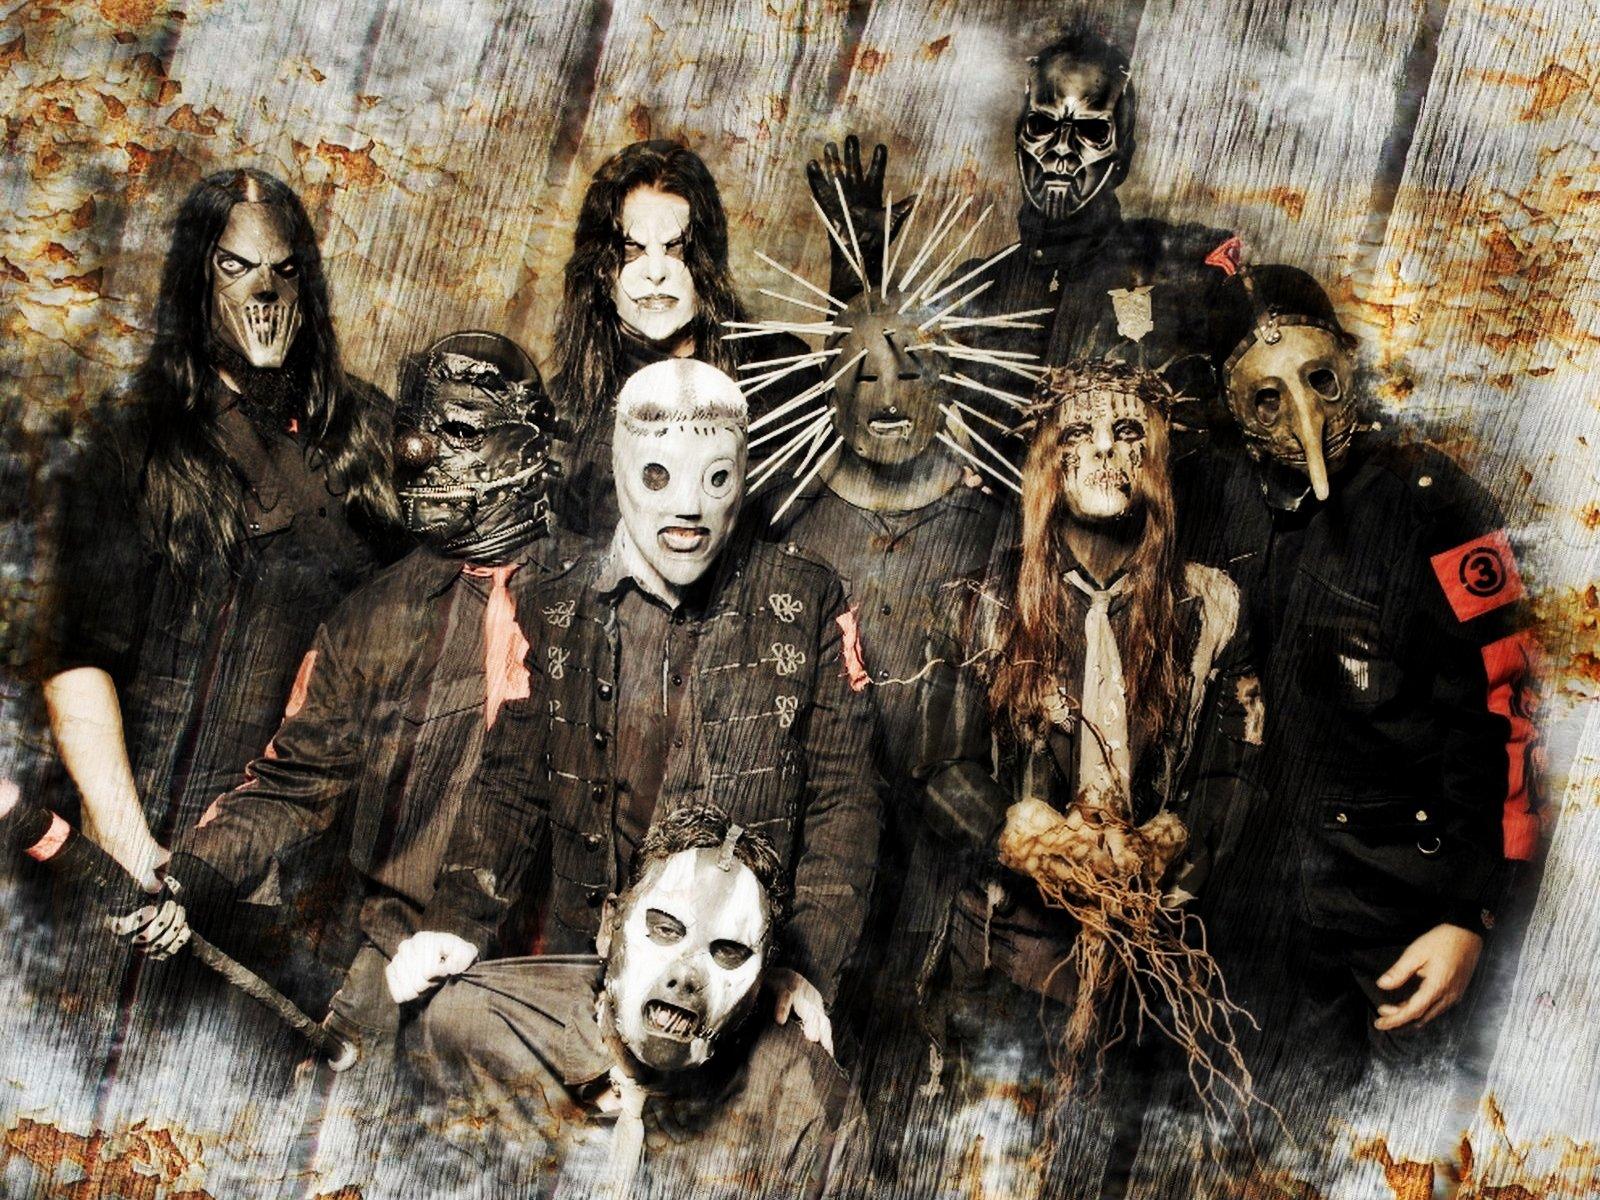 Papel de Parede Slipknot Metal Wallpaper para Download no Celular ou 1600x1200